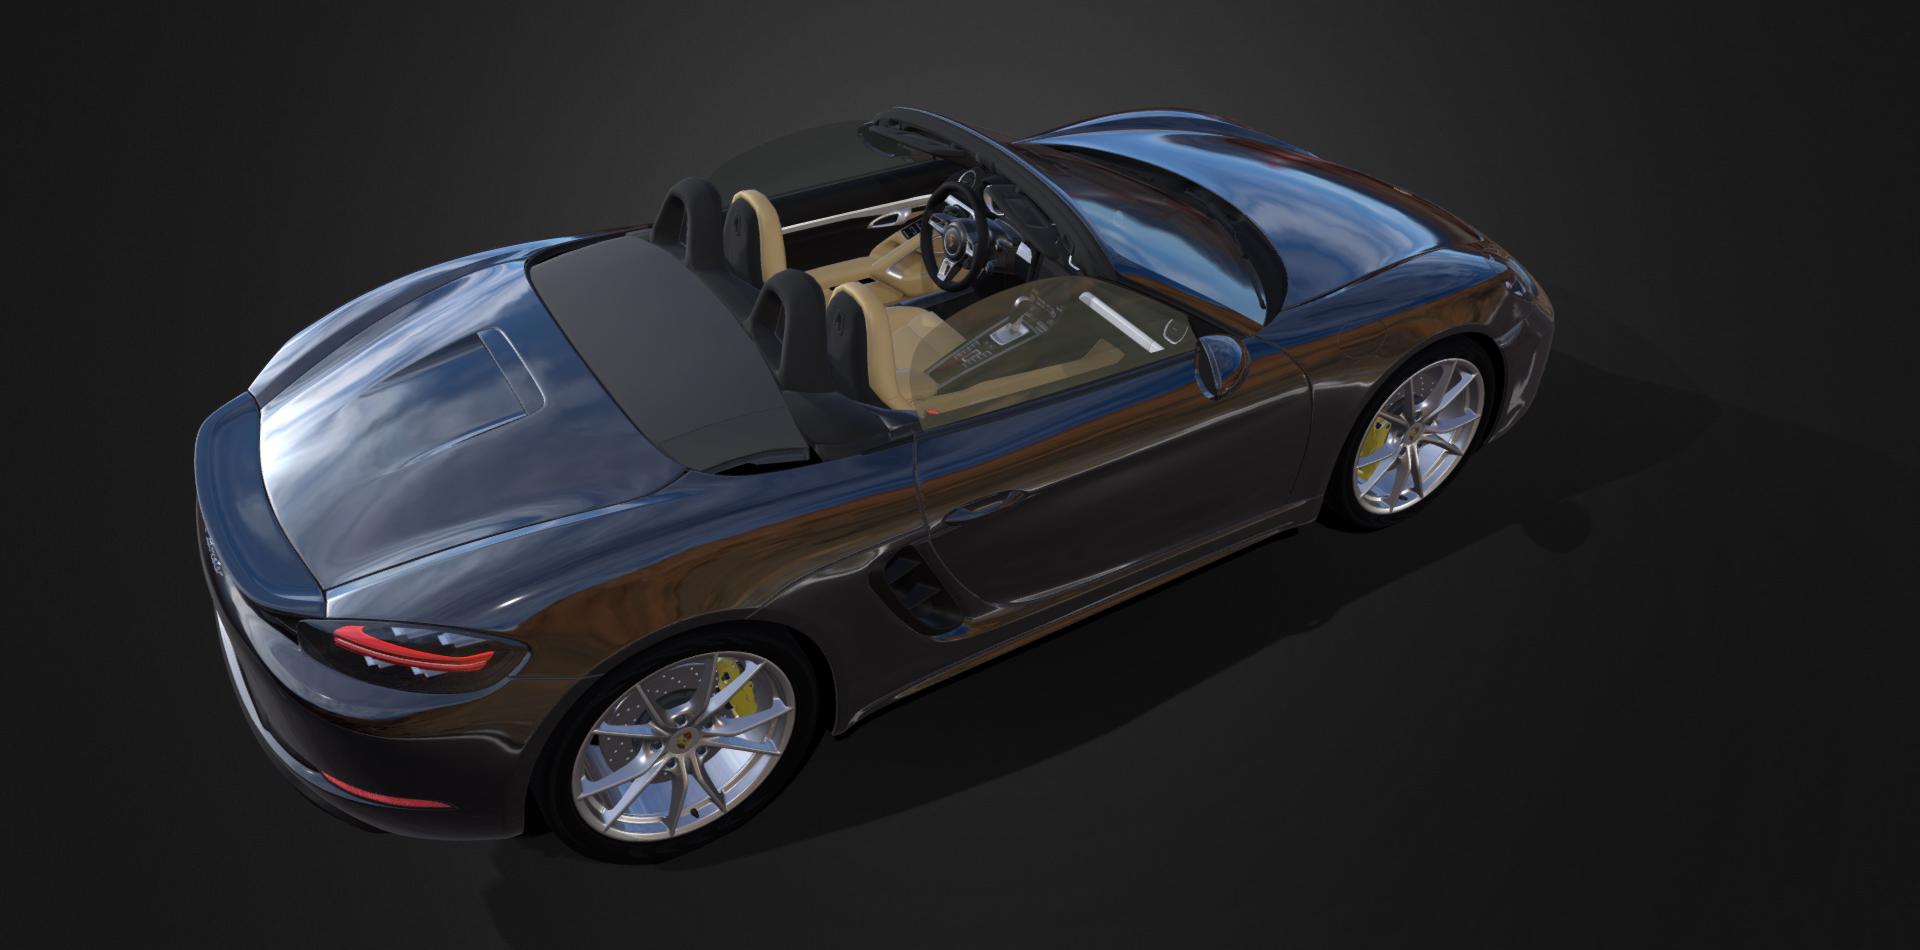 3D Model by Paul Safko   Porsche Boxster 718